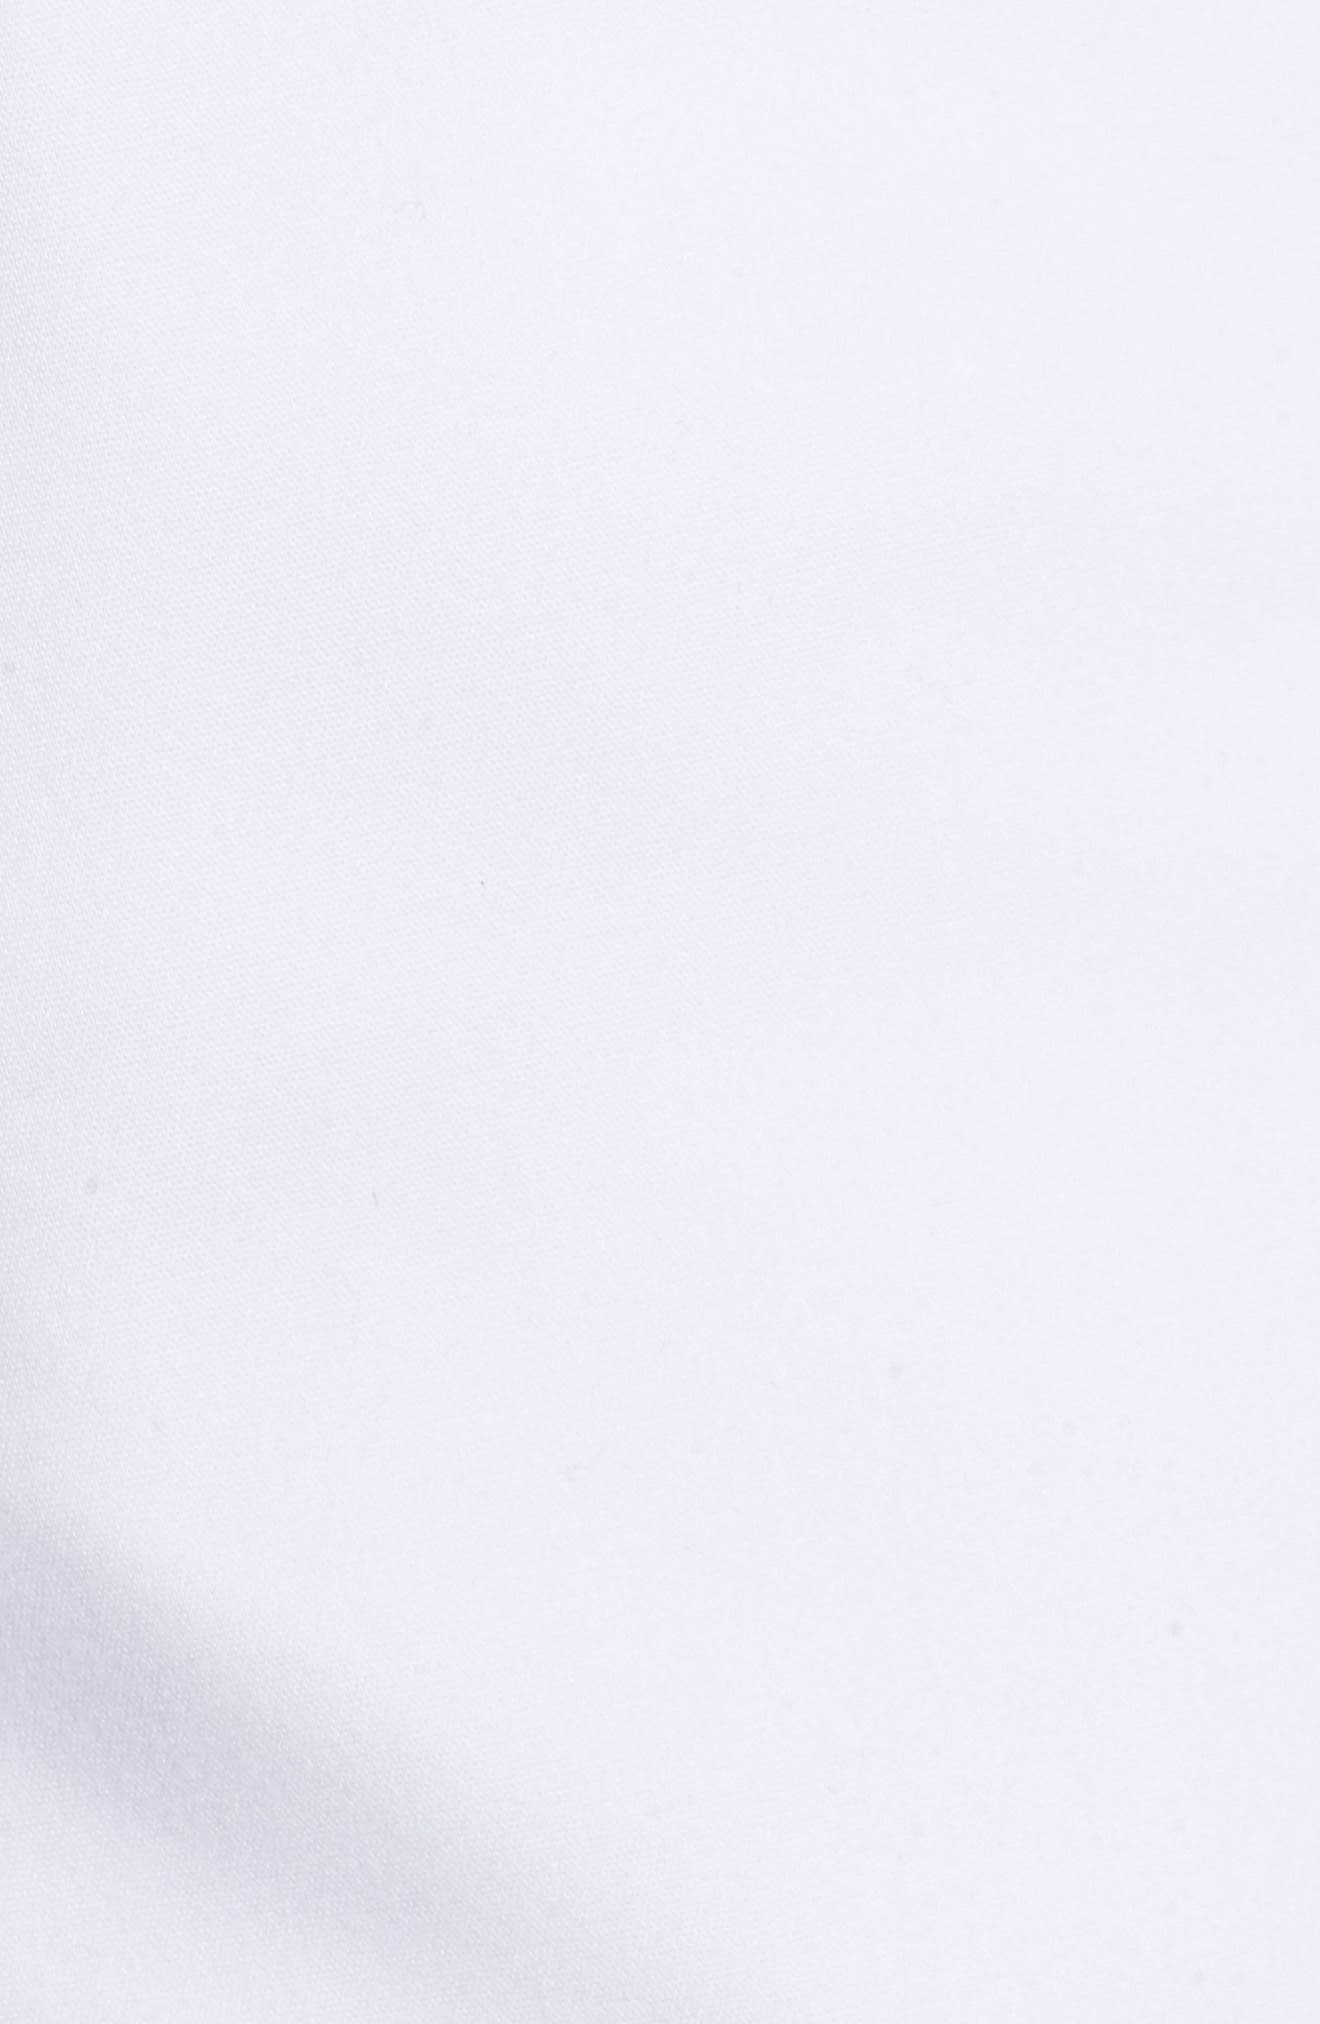 Park South Shorts,                             Alternate thumbnail 5, color,                             White